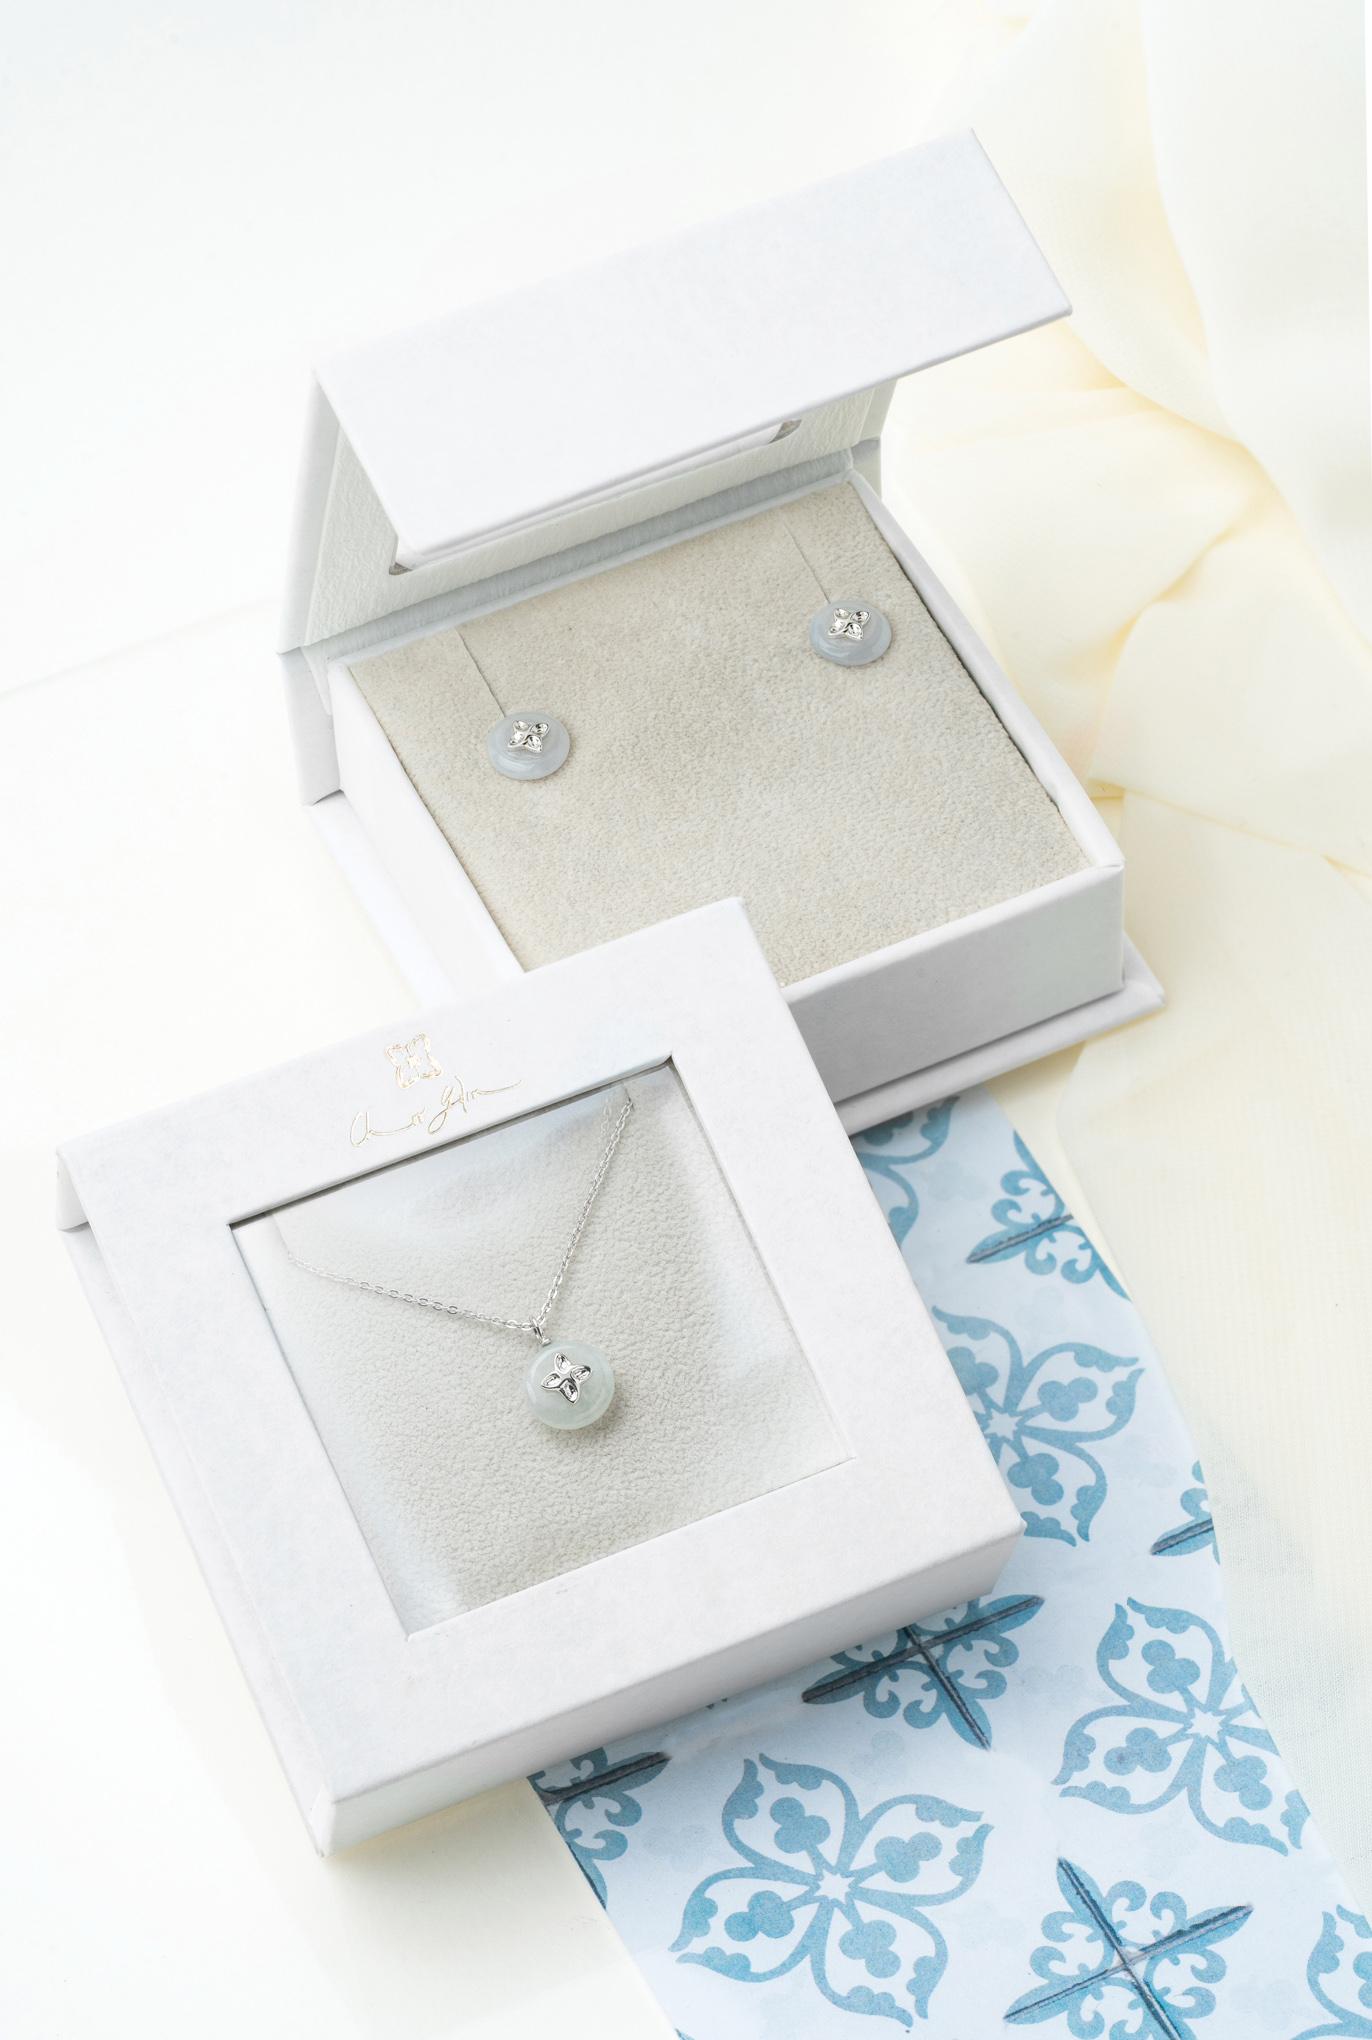 Choo Yilin_Emblem Jade Collection_Web-00172.jpg